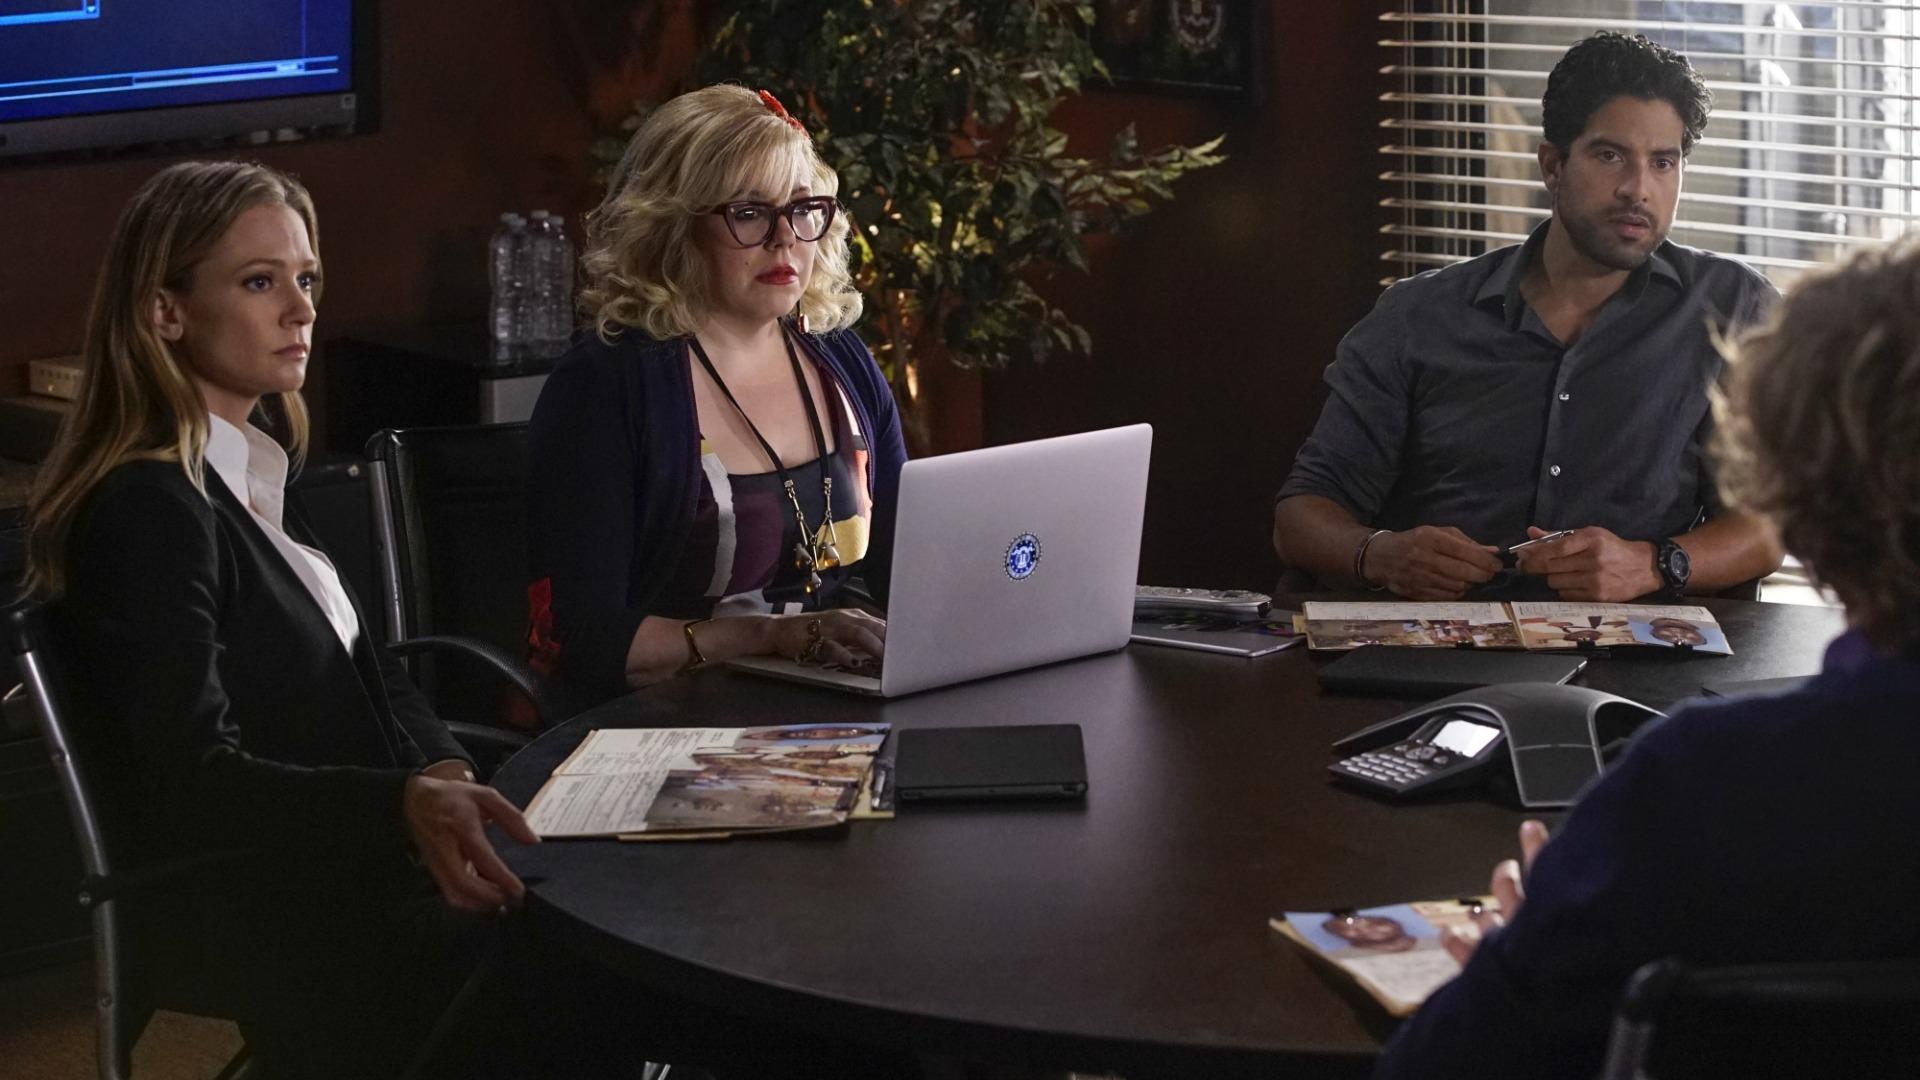 JJ, Garcia, and Alvez listen as Dr. Reid explains a theory.